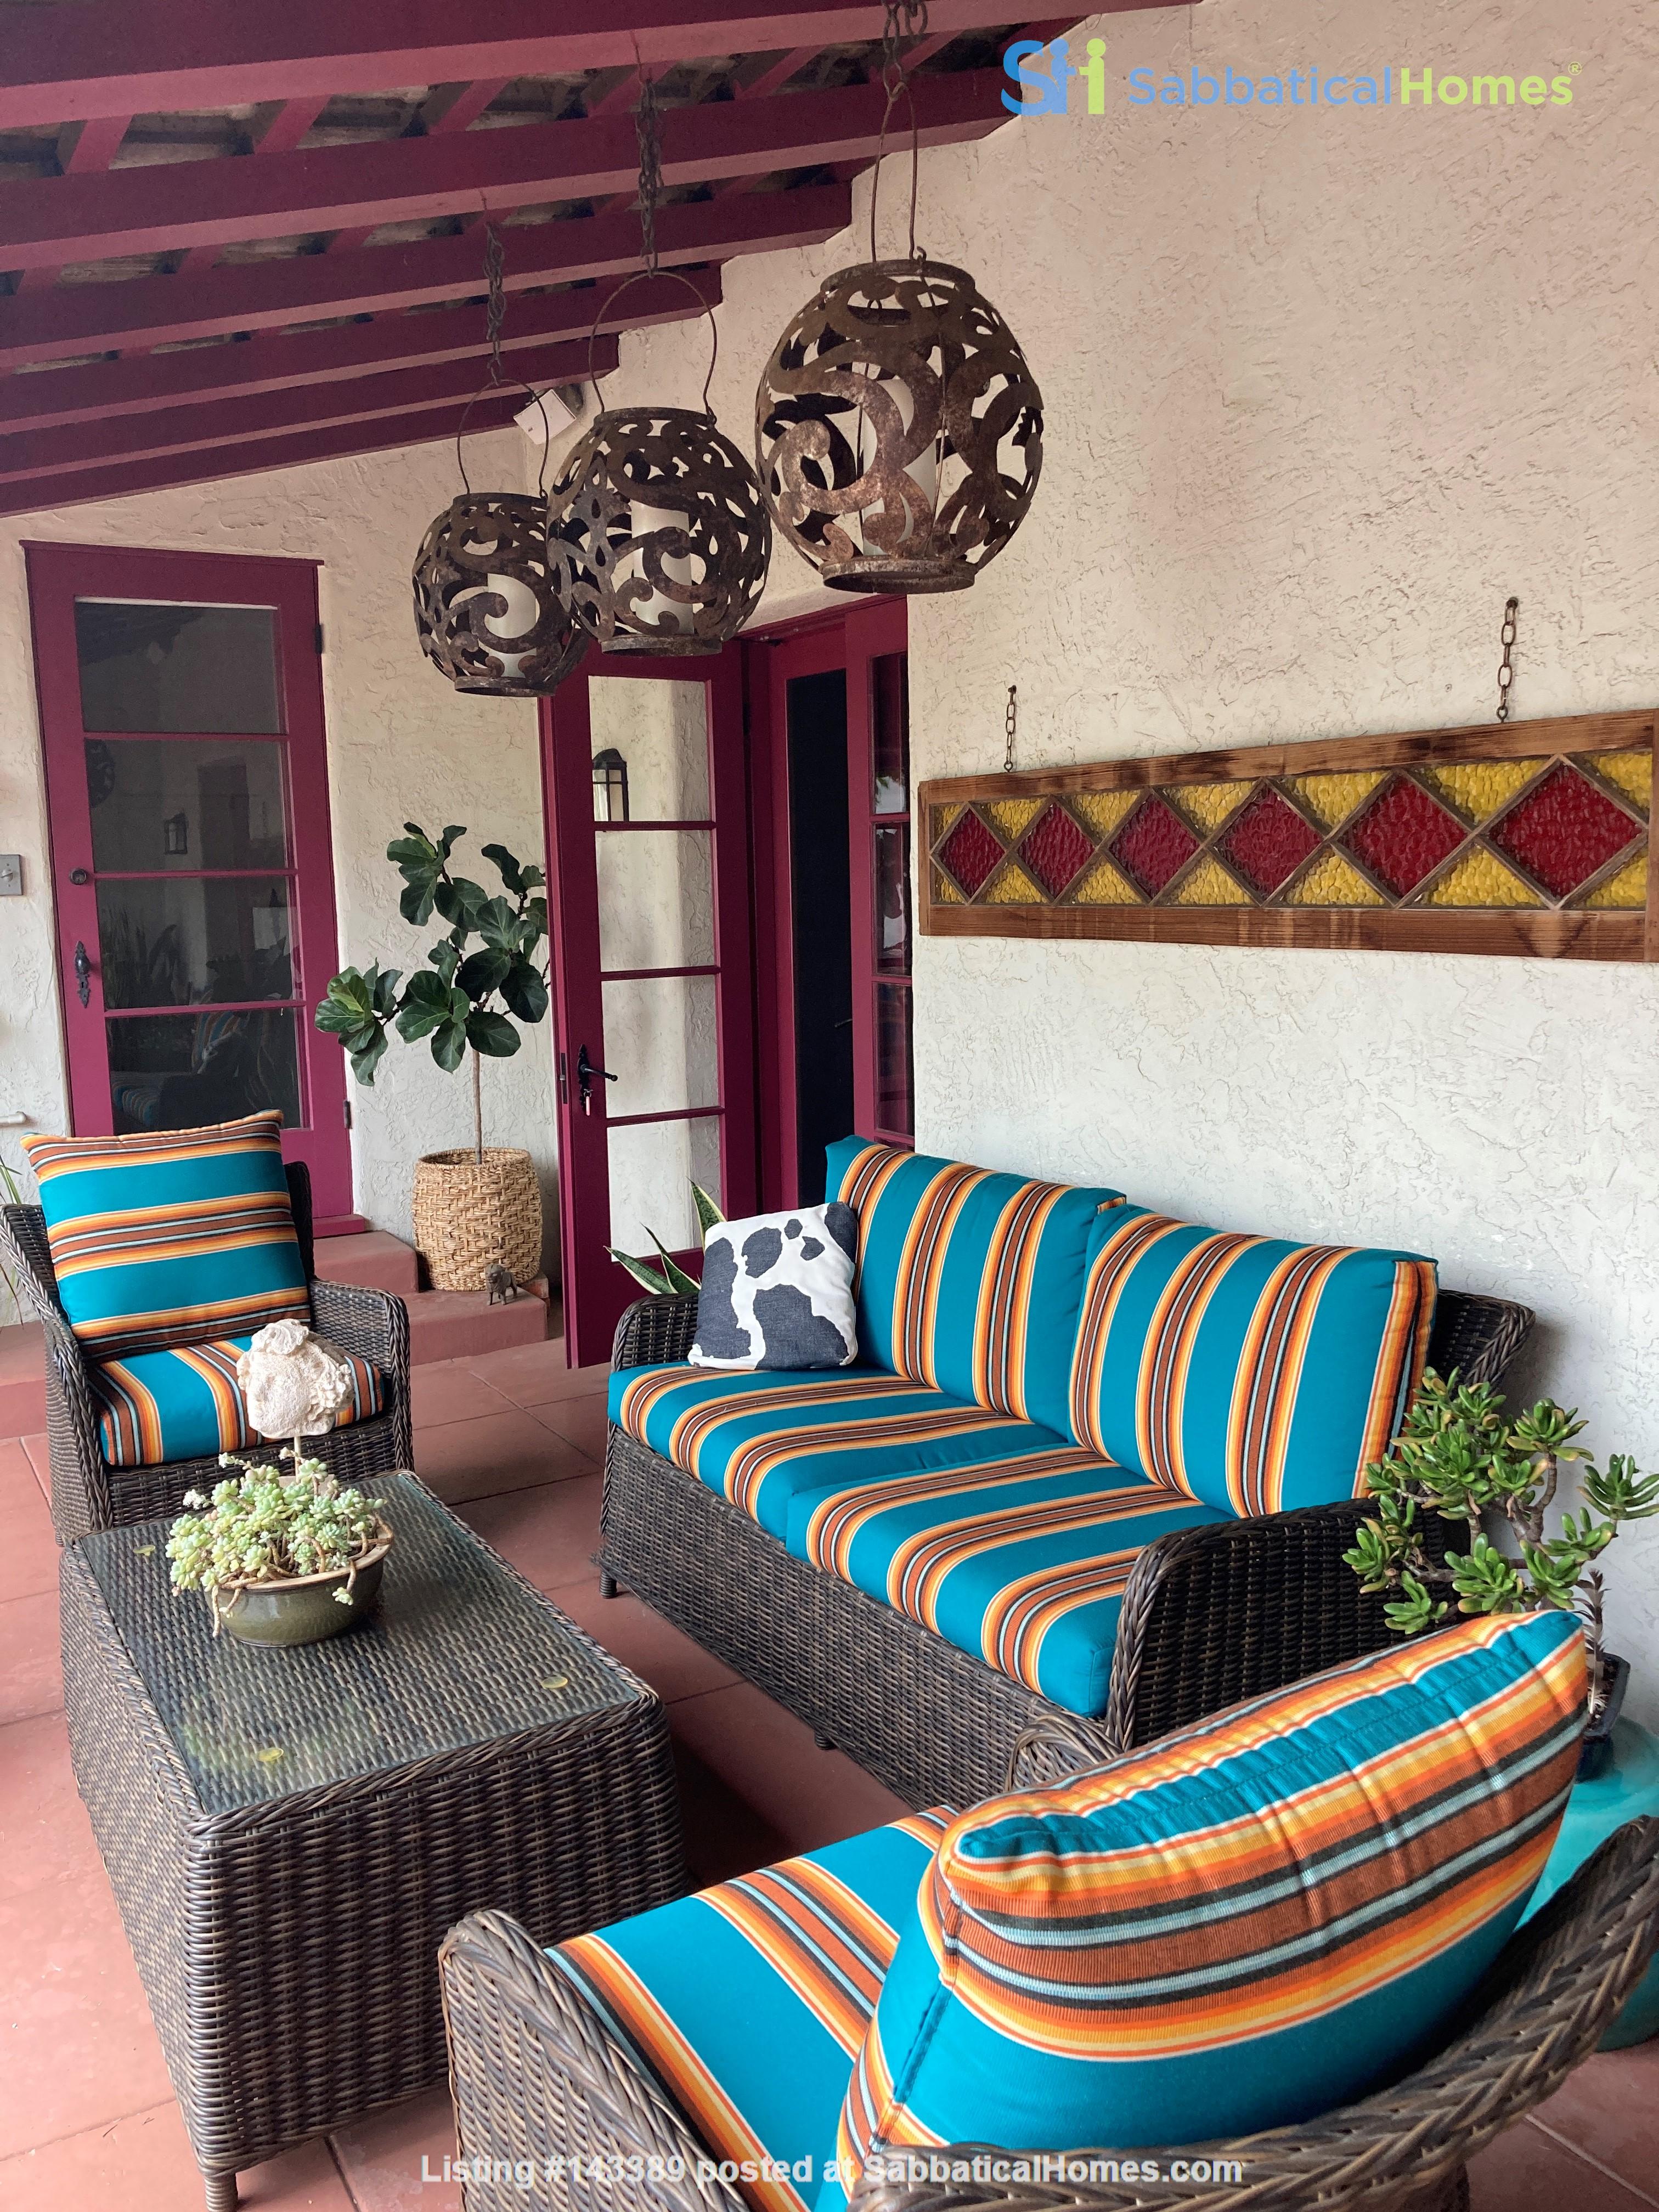 Gracious Coronado Home Near Beaches & San Diego Bay Home Rental in Coronado, California, United States 2